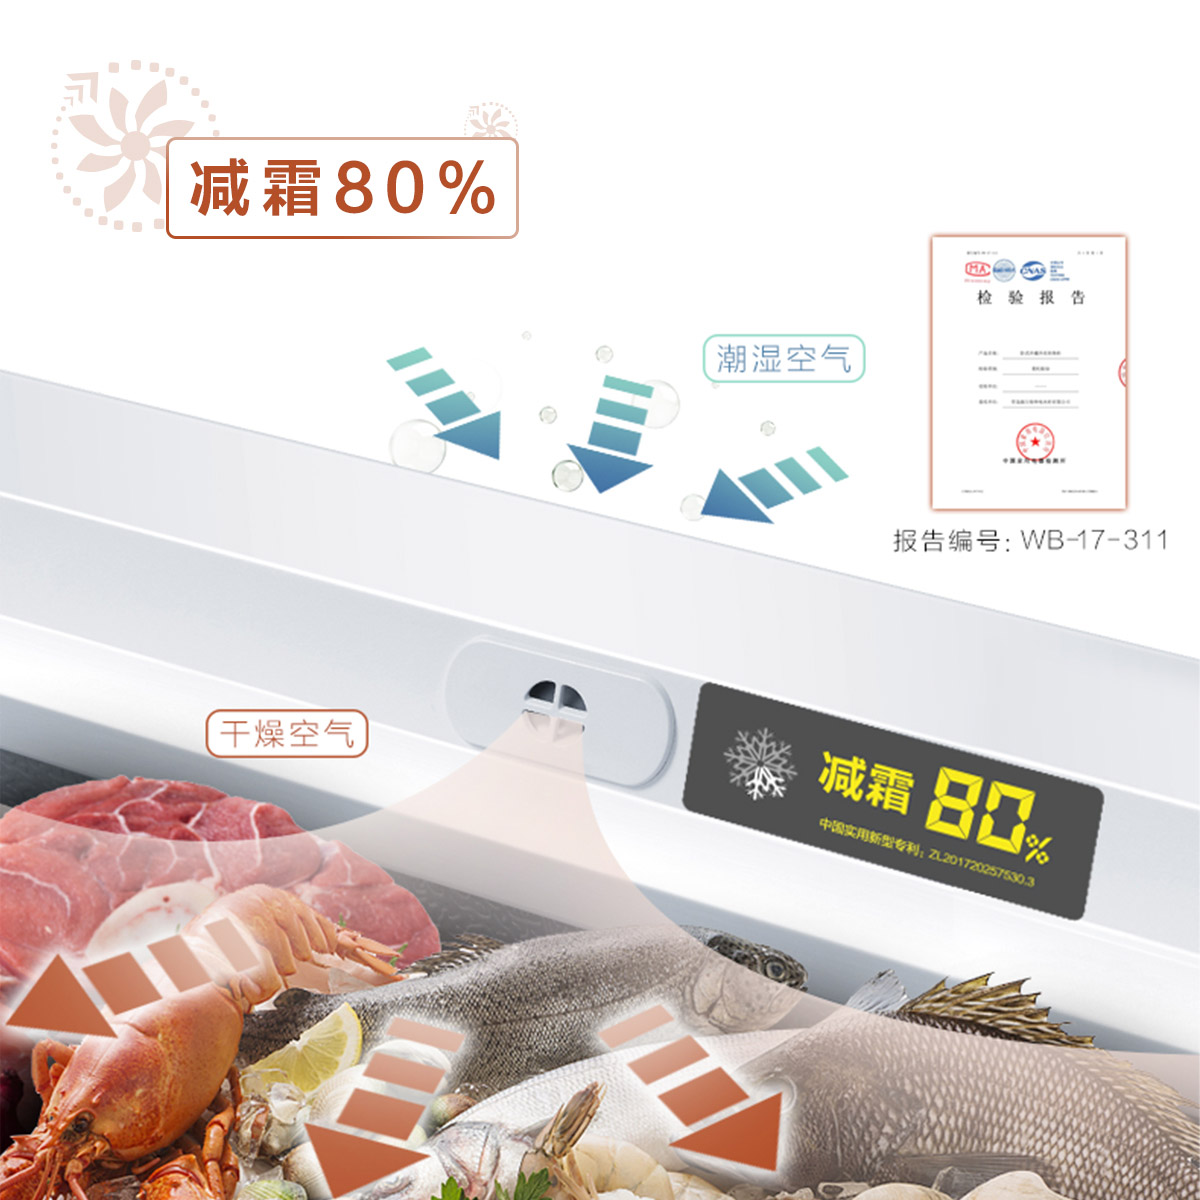 203HEM BD BC 海尔 Haier 海尔冰柜家用冷藏冷冻电脑控温节能冷柜